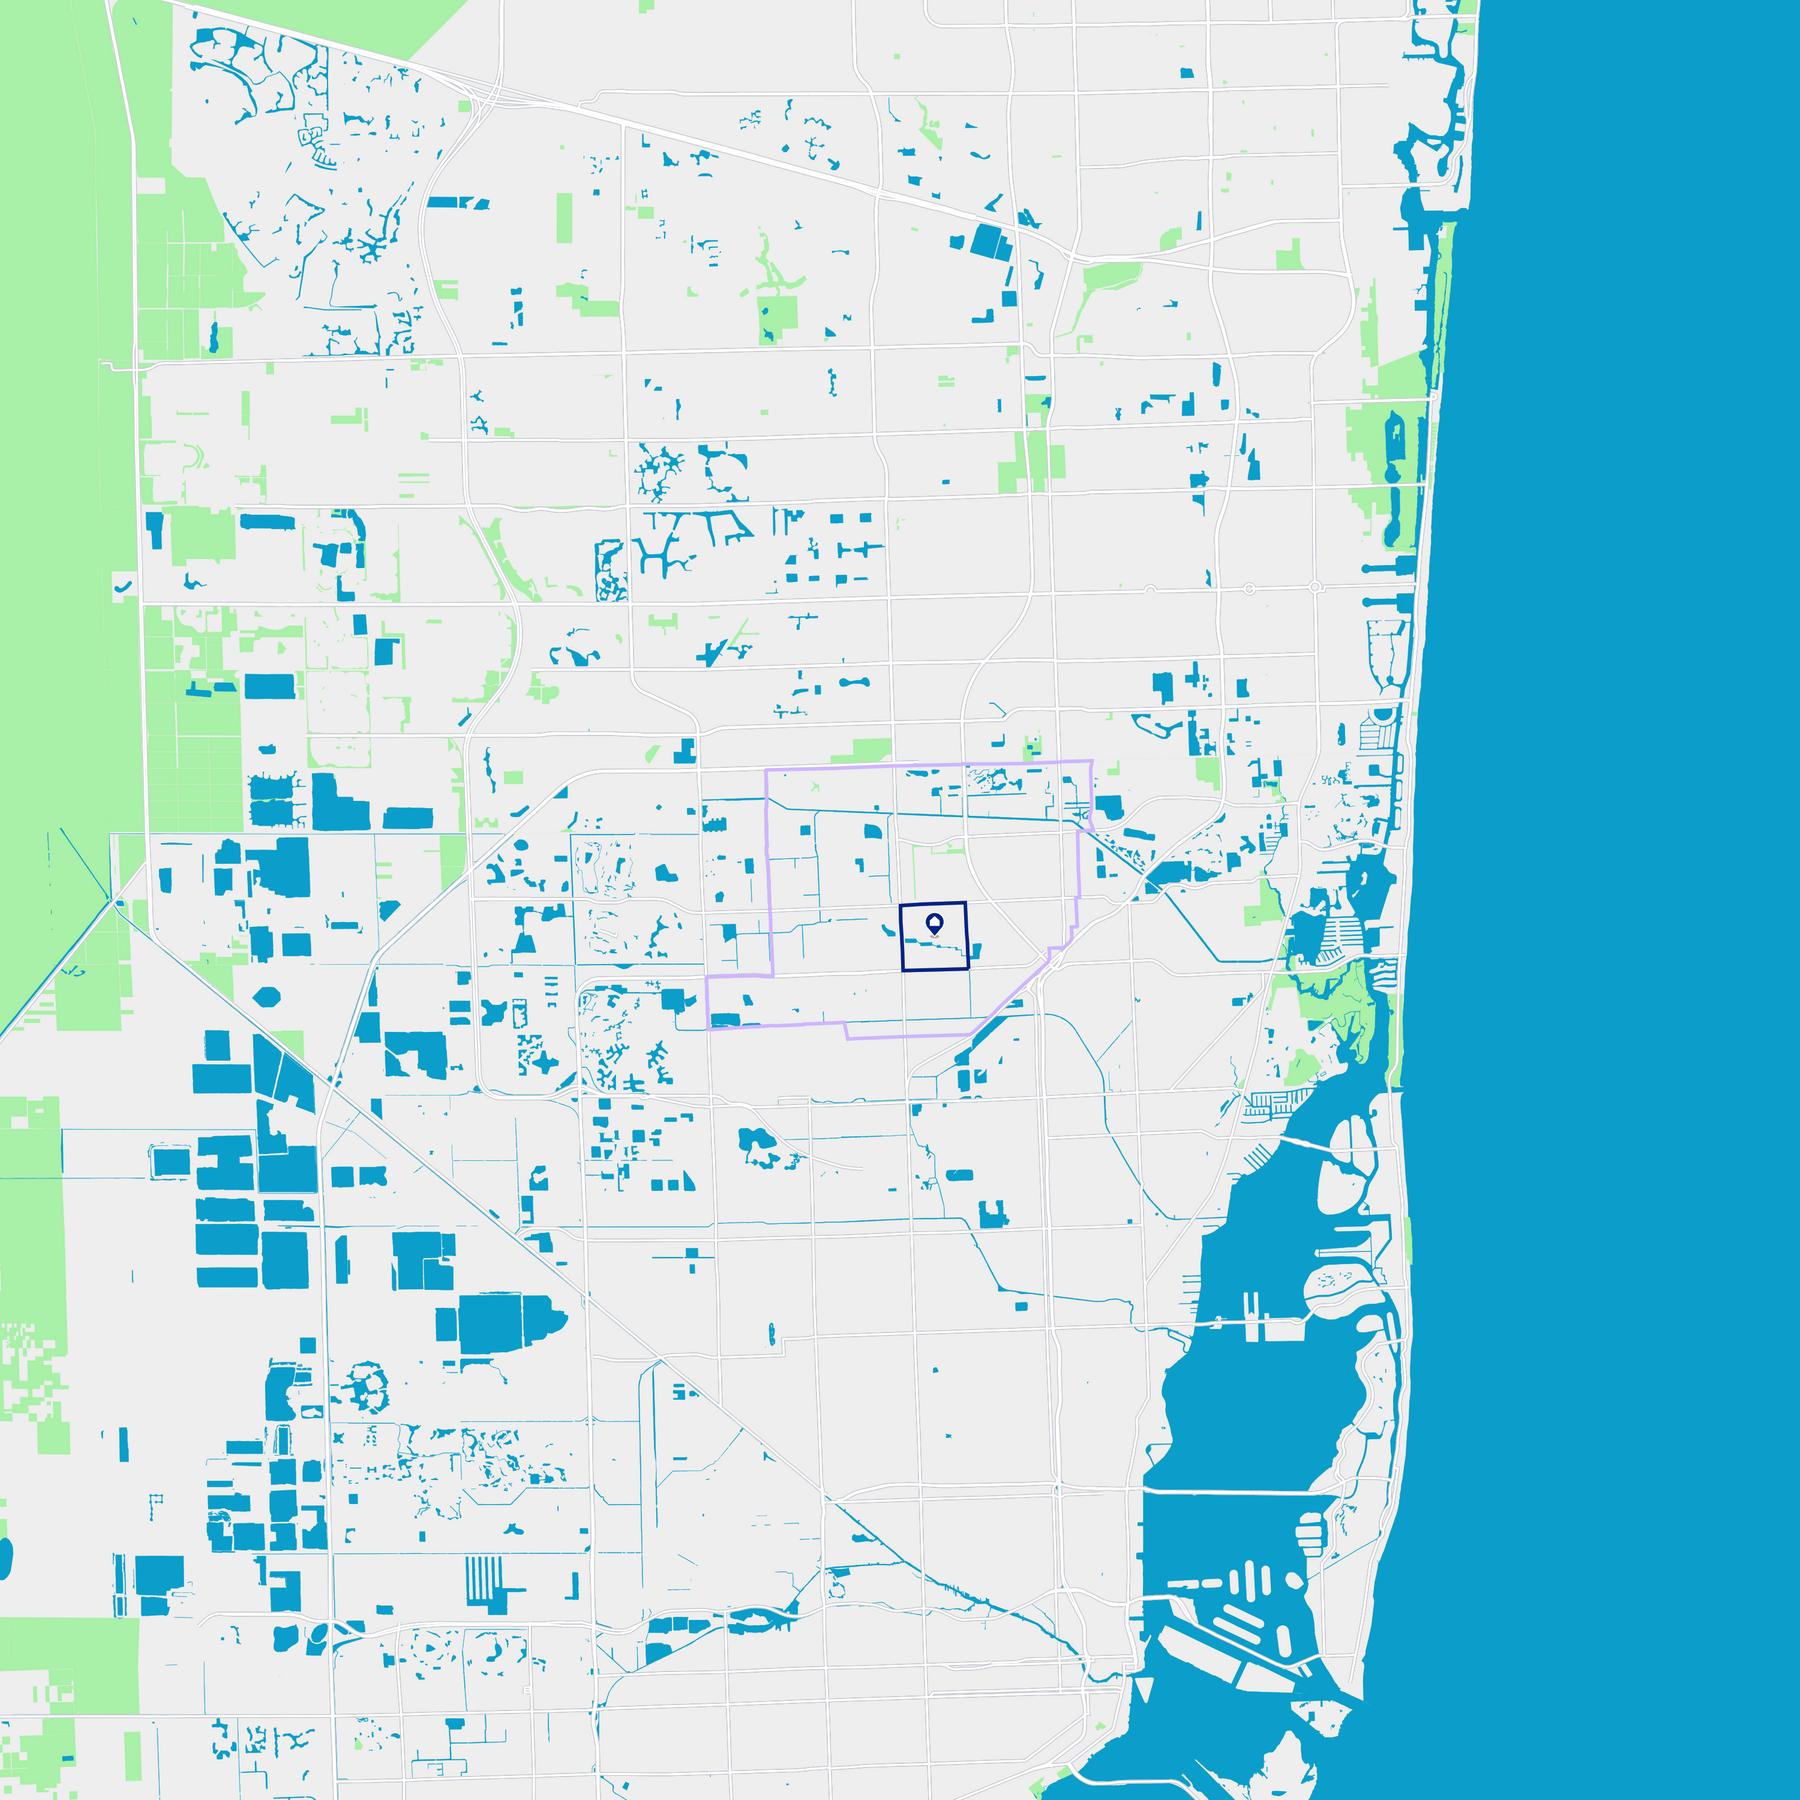 Parkview, Miami Gardens FL - Neighborhood Guide